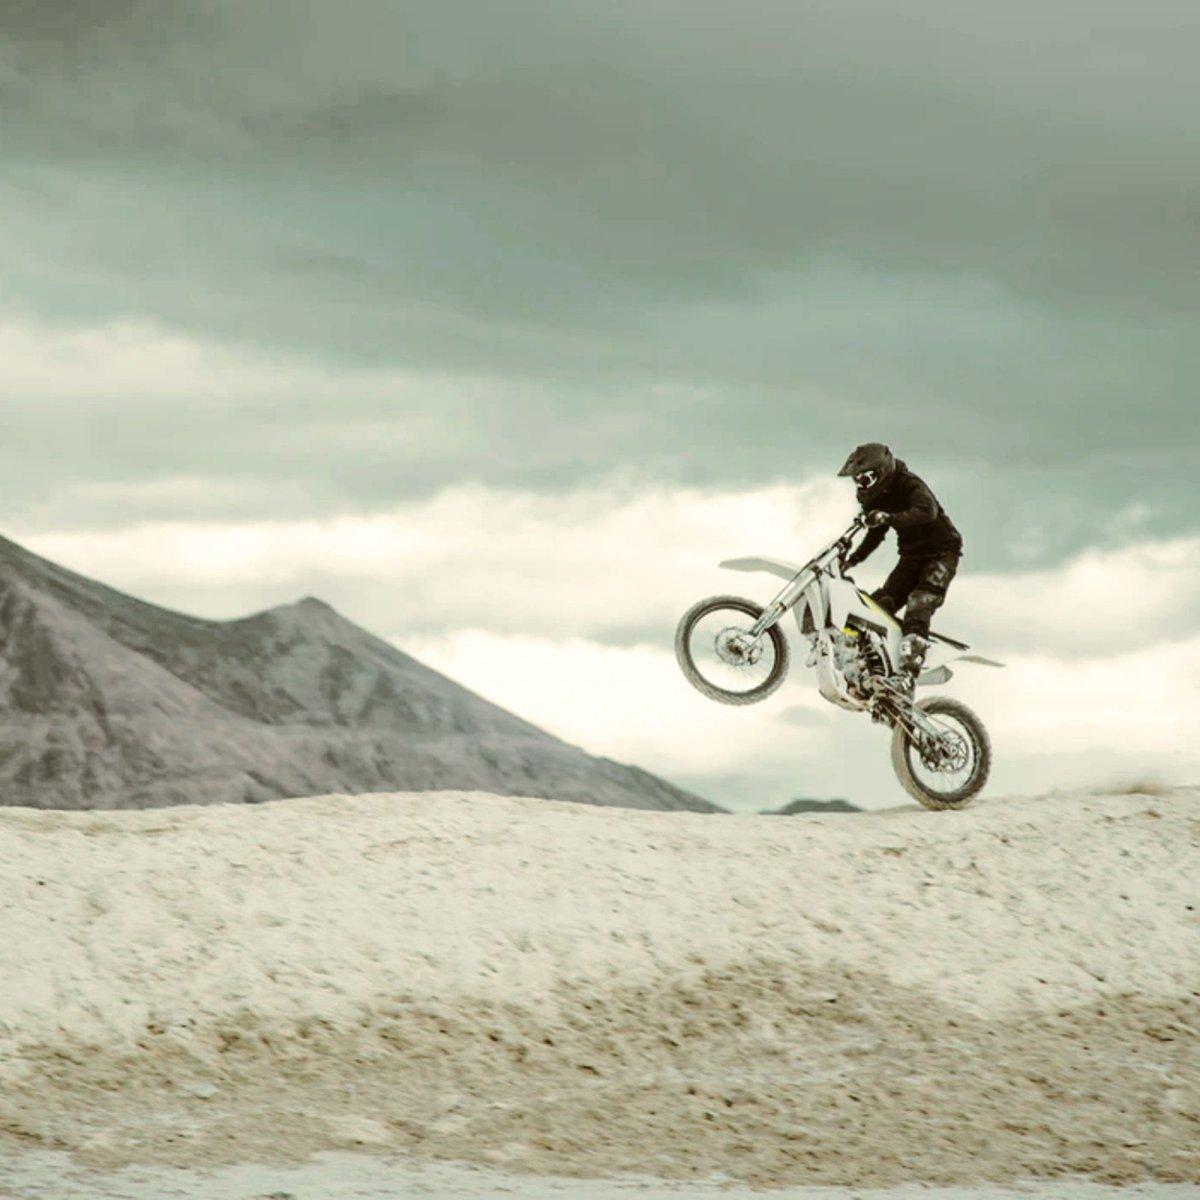 Bonneville Salt Flats, Utah, USA